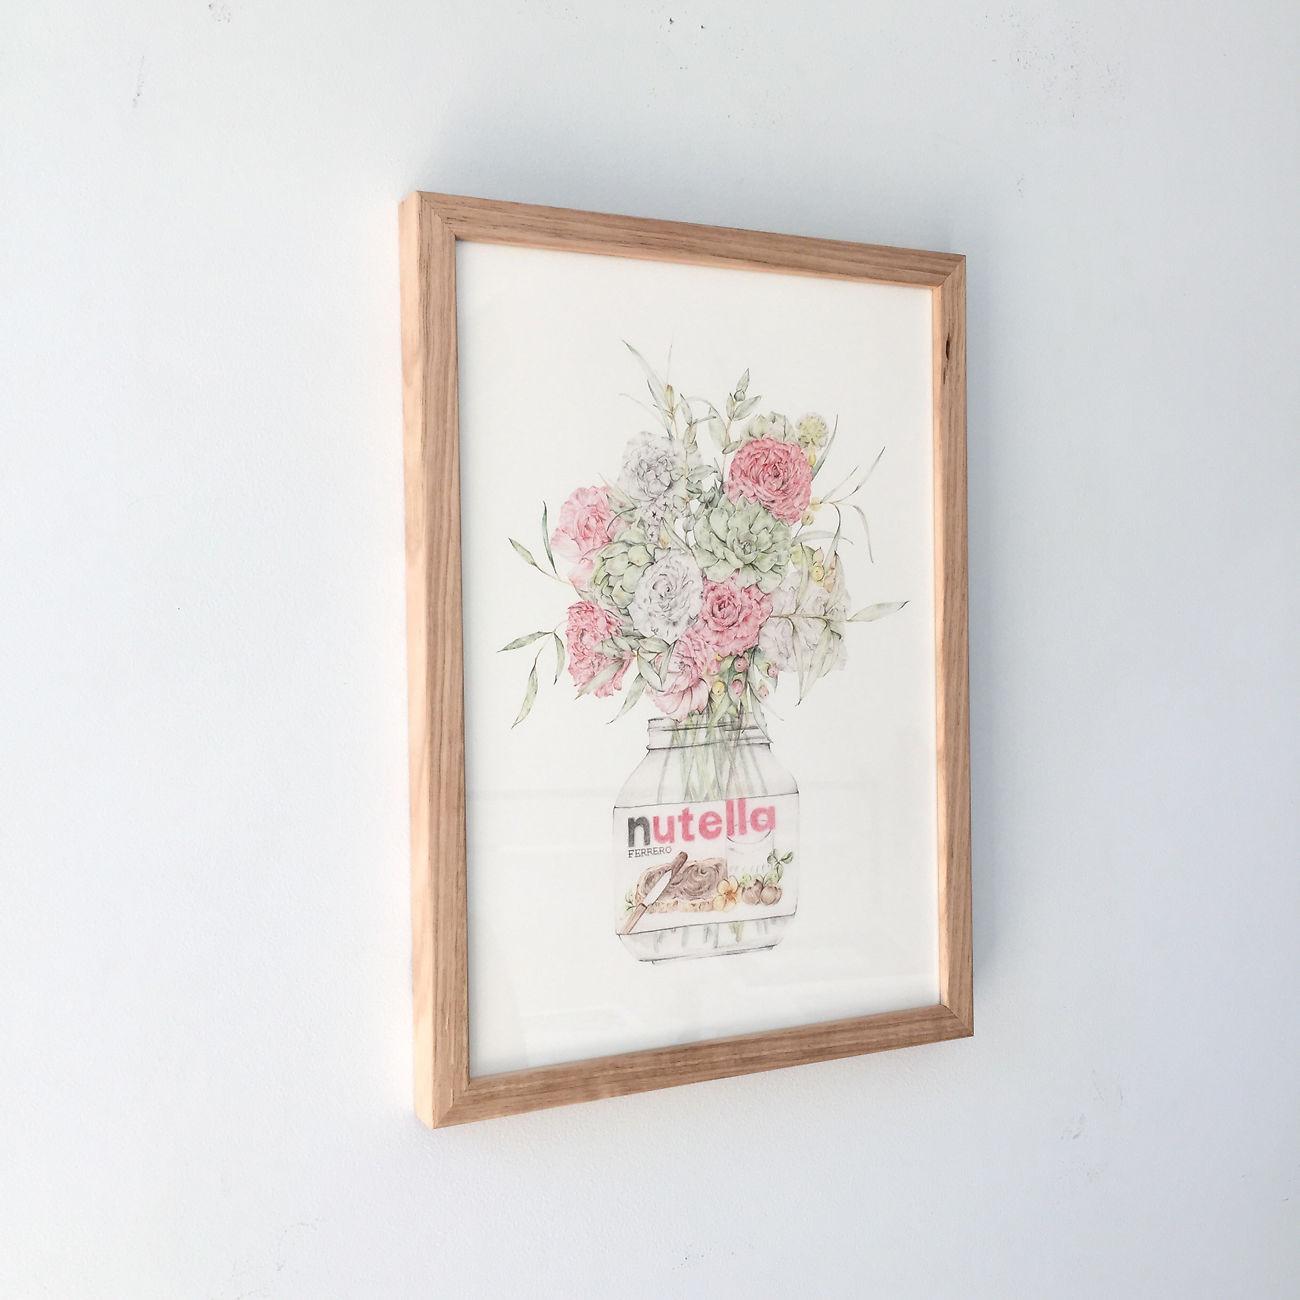 Tasmanian Oak Gallery Frame Image